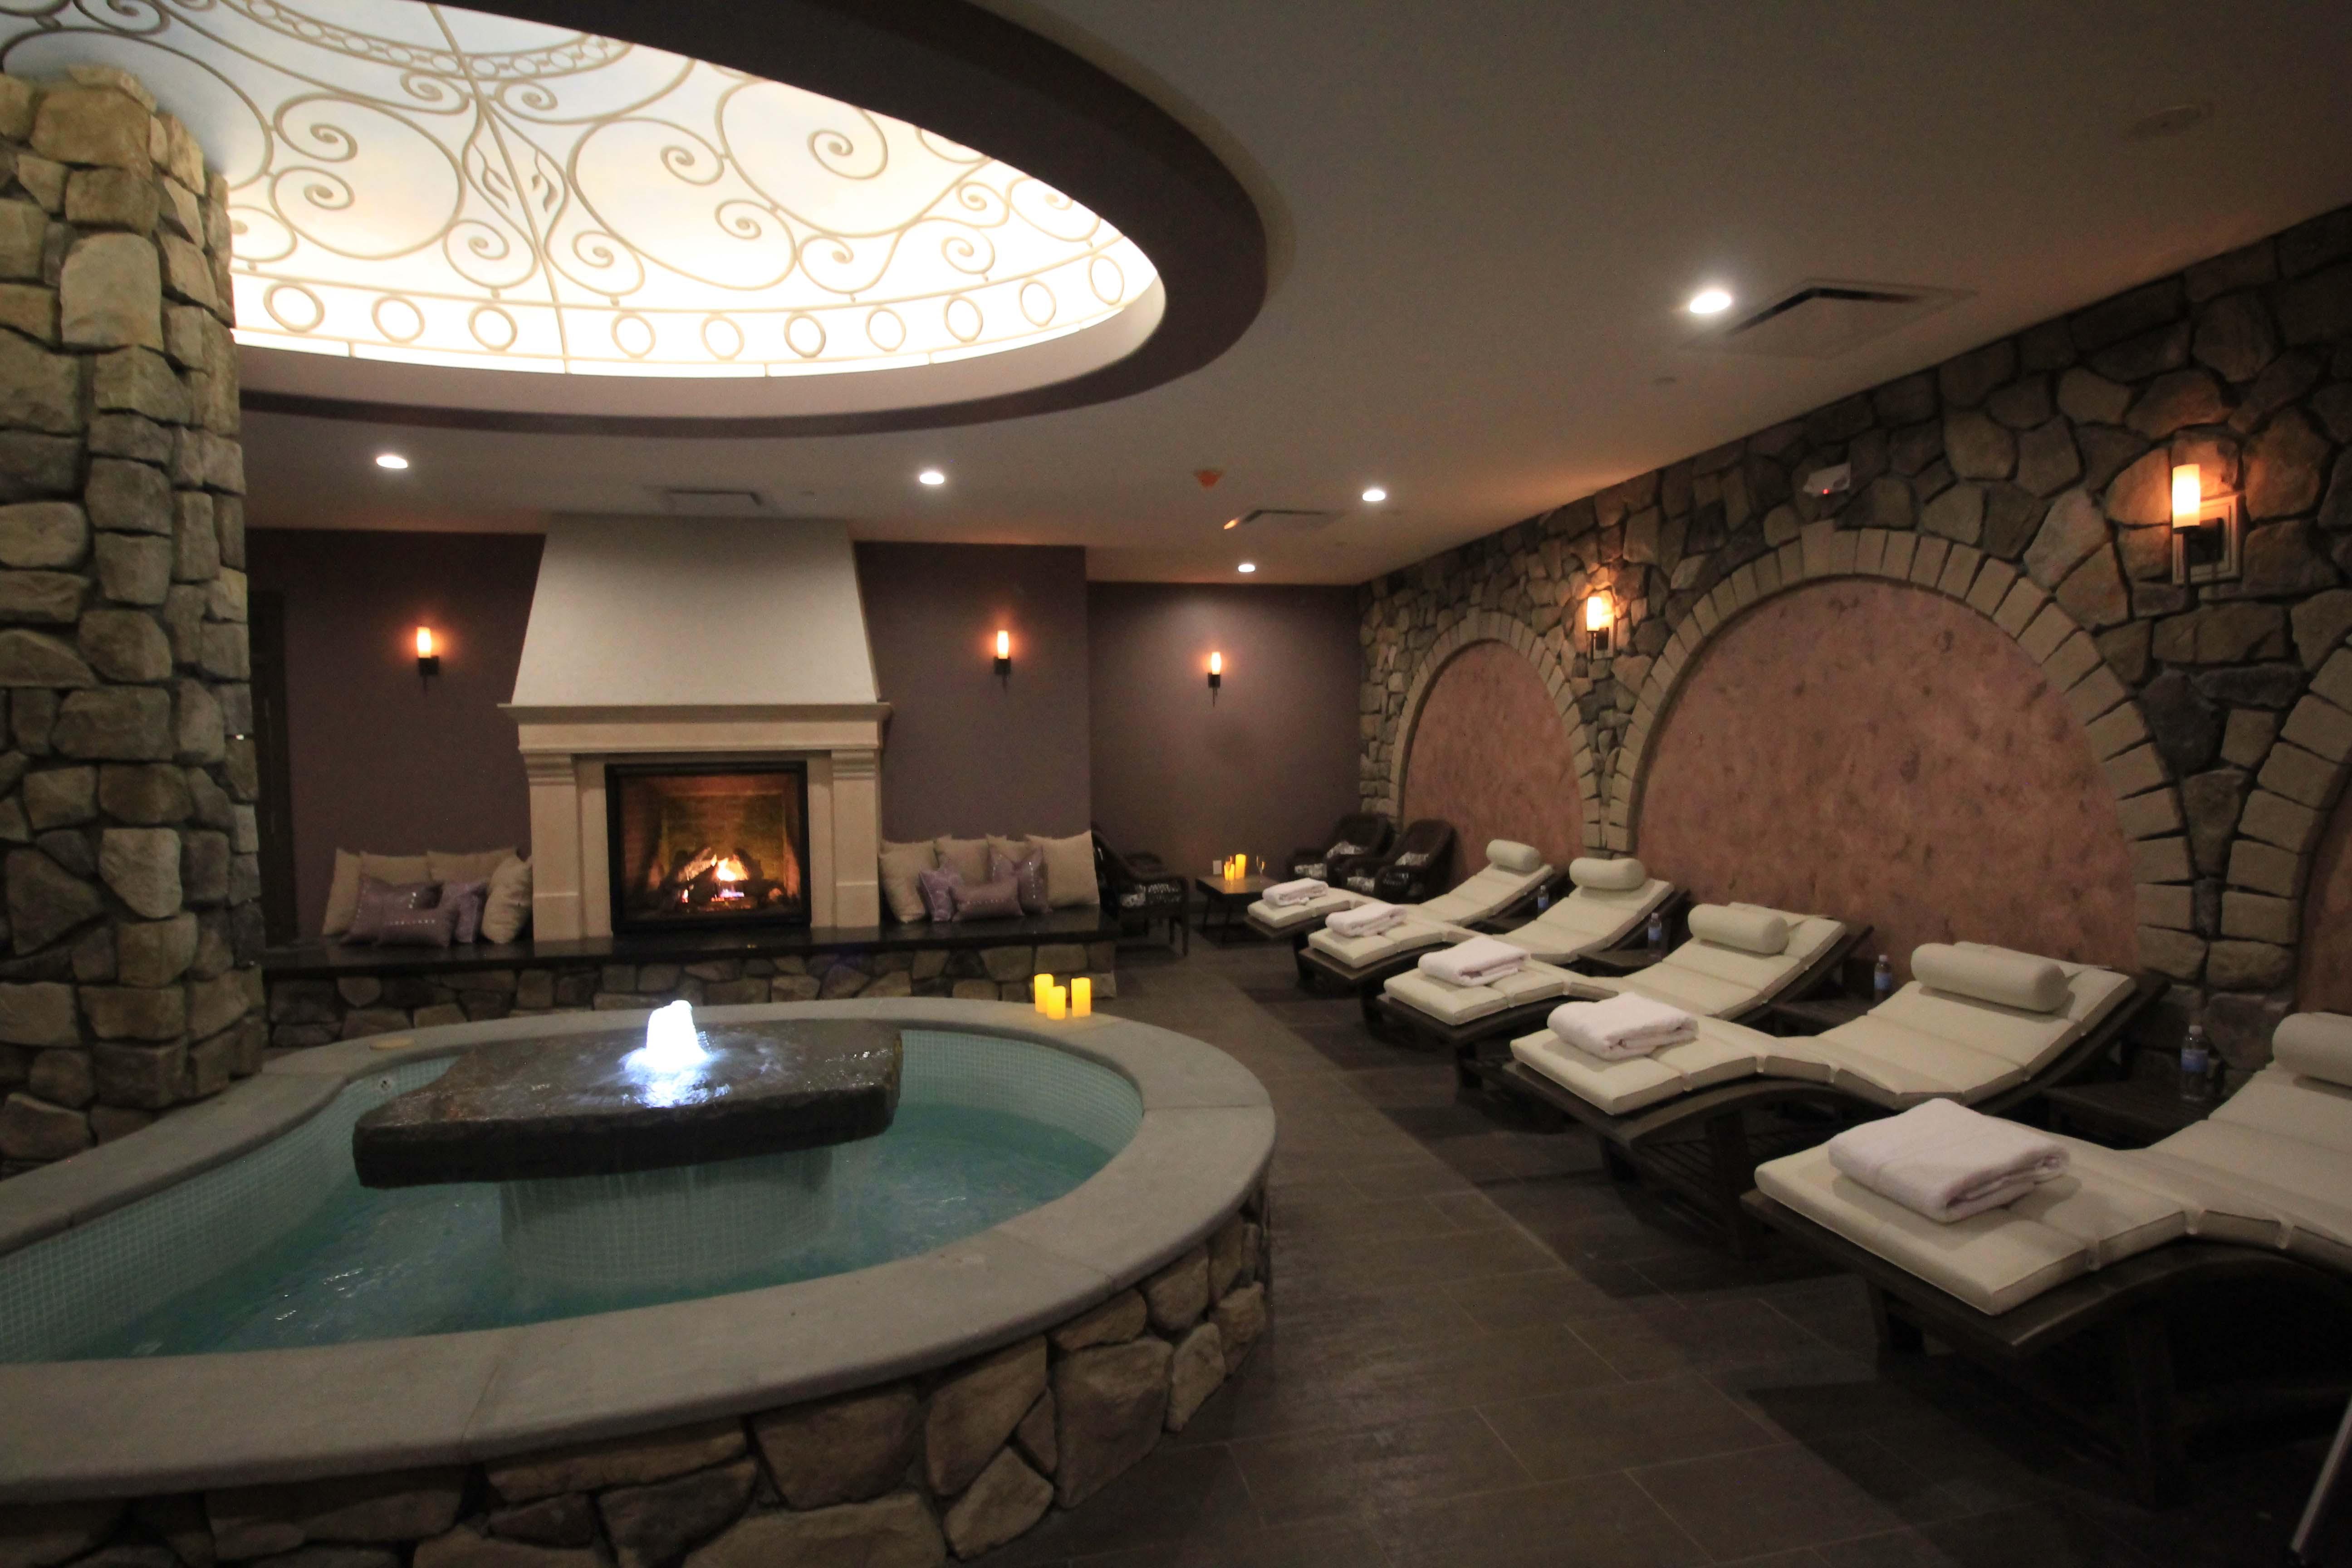 Spa Mirbeau Opens In Crossgates Mall Offers World Class Treatments